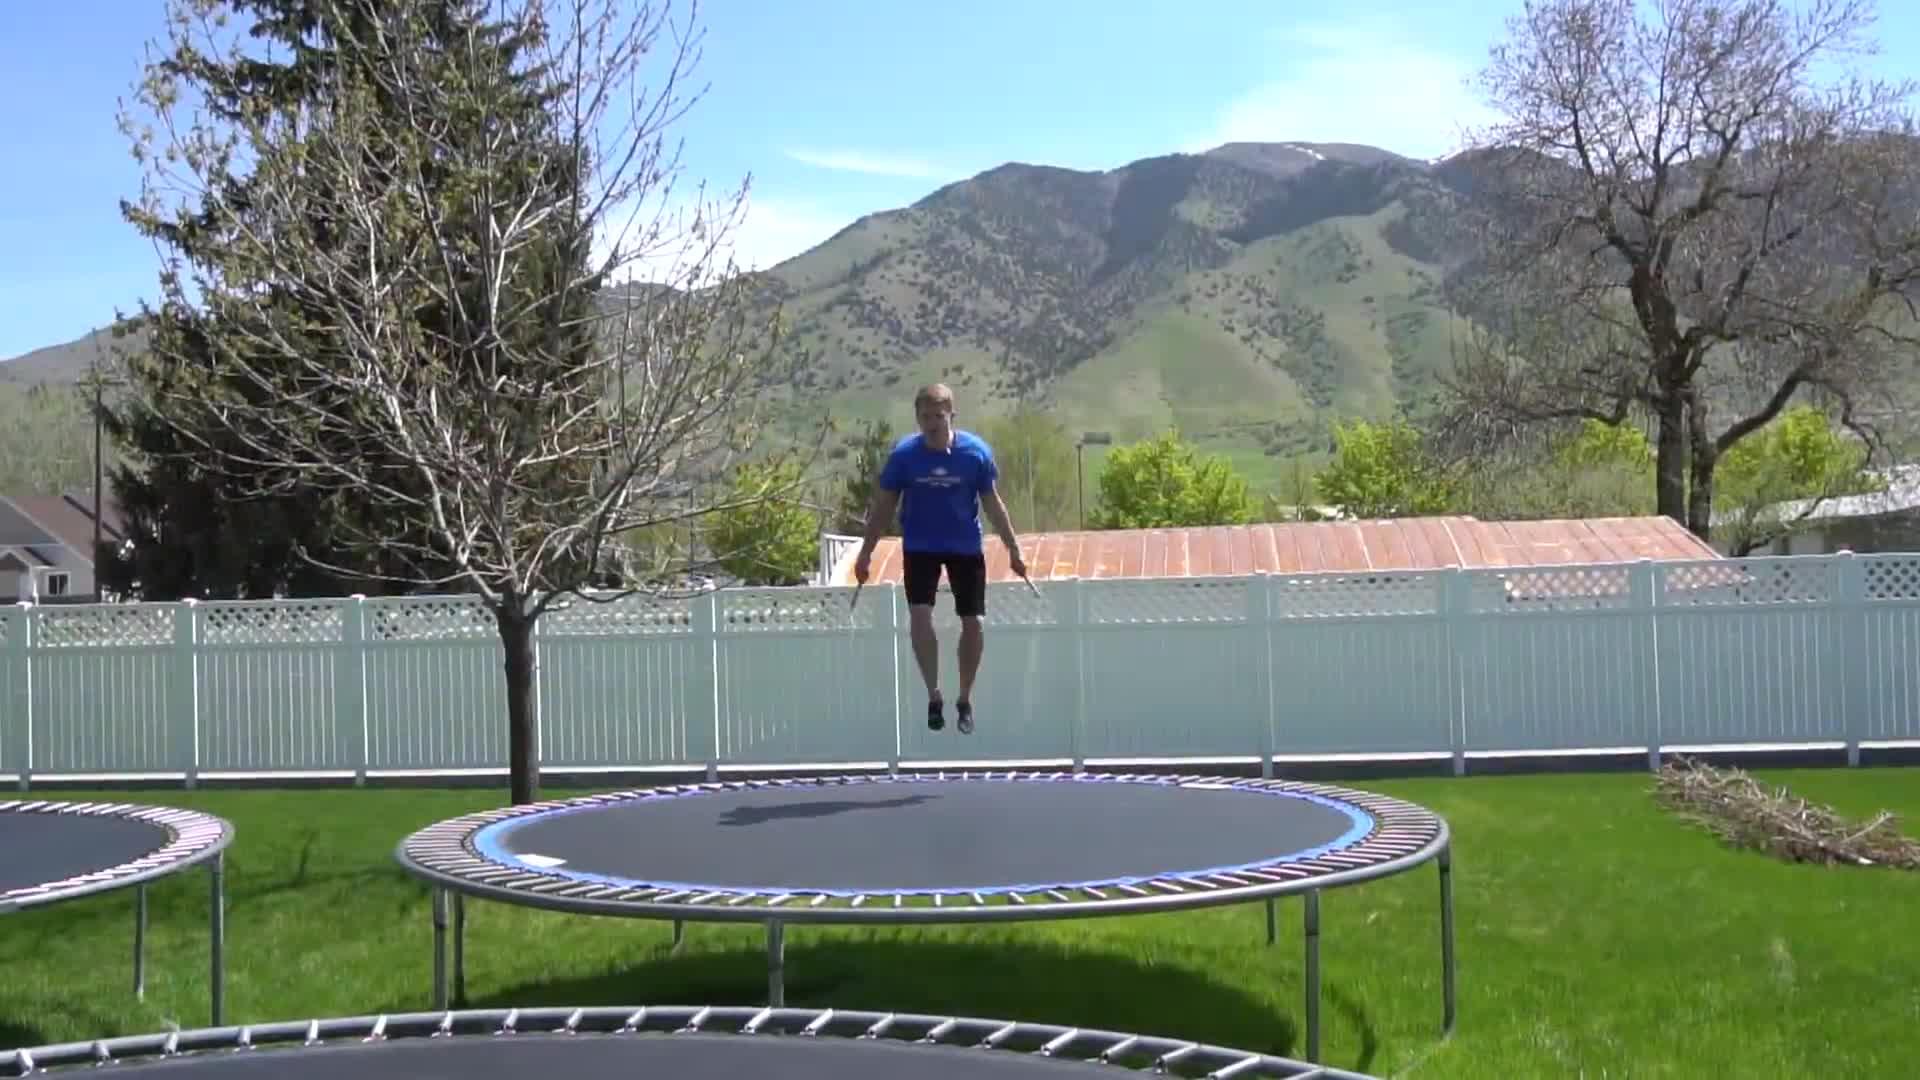 Film & Animation, JOLT 2018, LJ jump rope, LJ lavecchia, WeJumpRope Music Videos, just jumpin, tire swing, wejumprope, May 2018 (Part I) - Utah, JOLT, and Tire Swing Runs GIFs